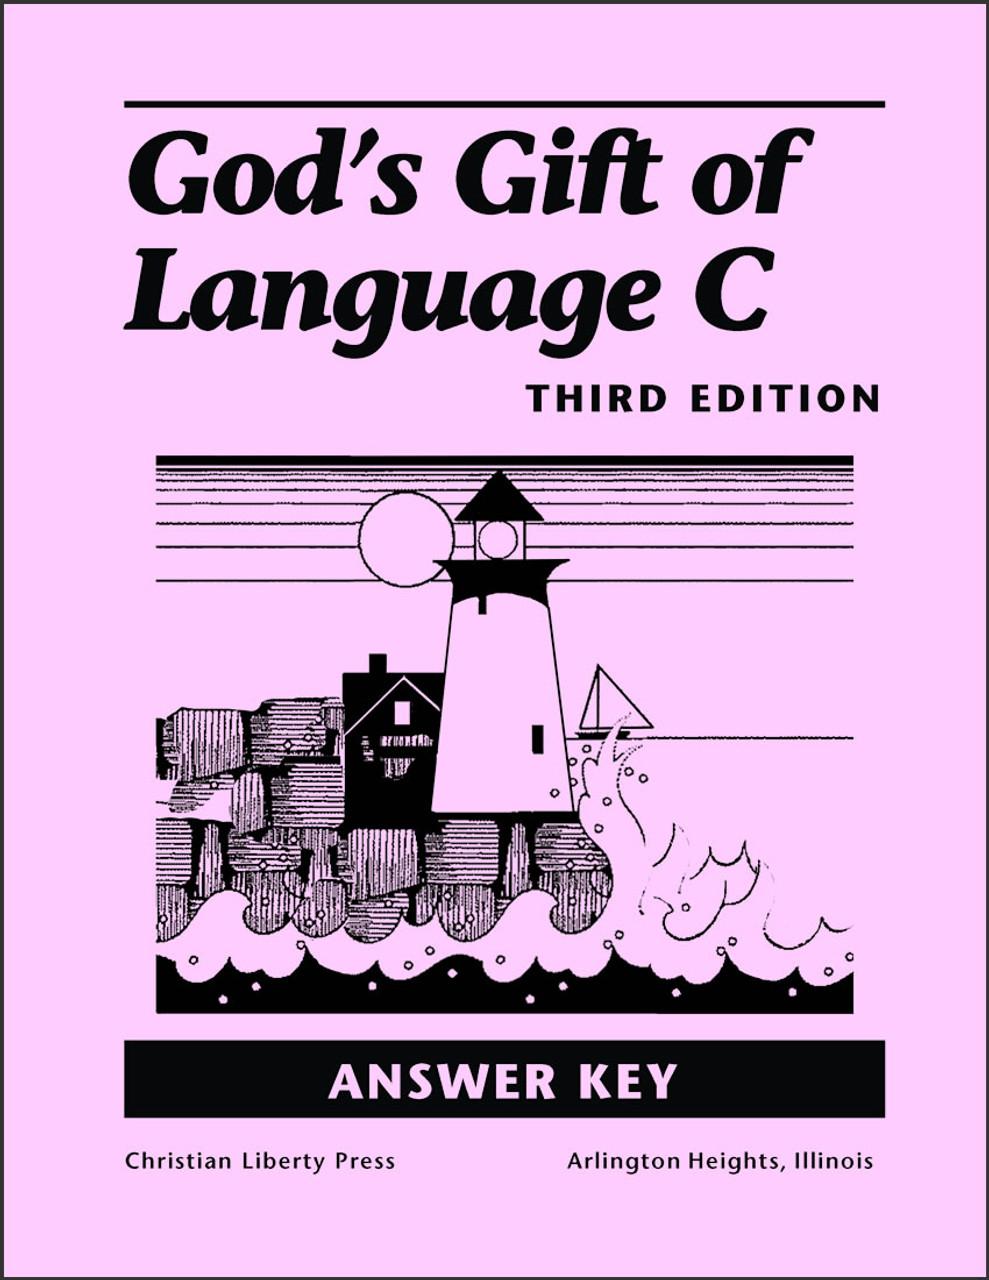 God's Gift of Language C, 3rd edition - Answer Key